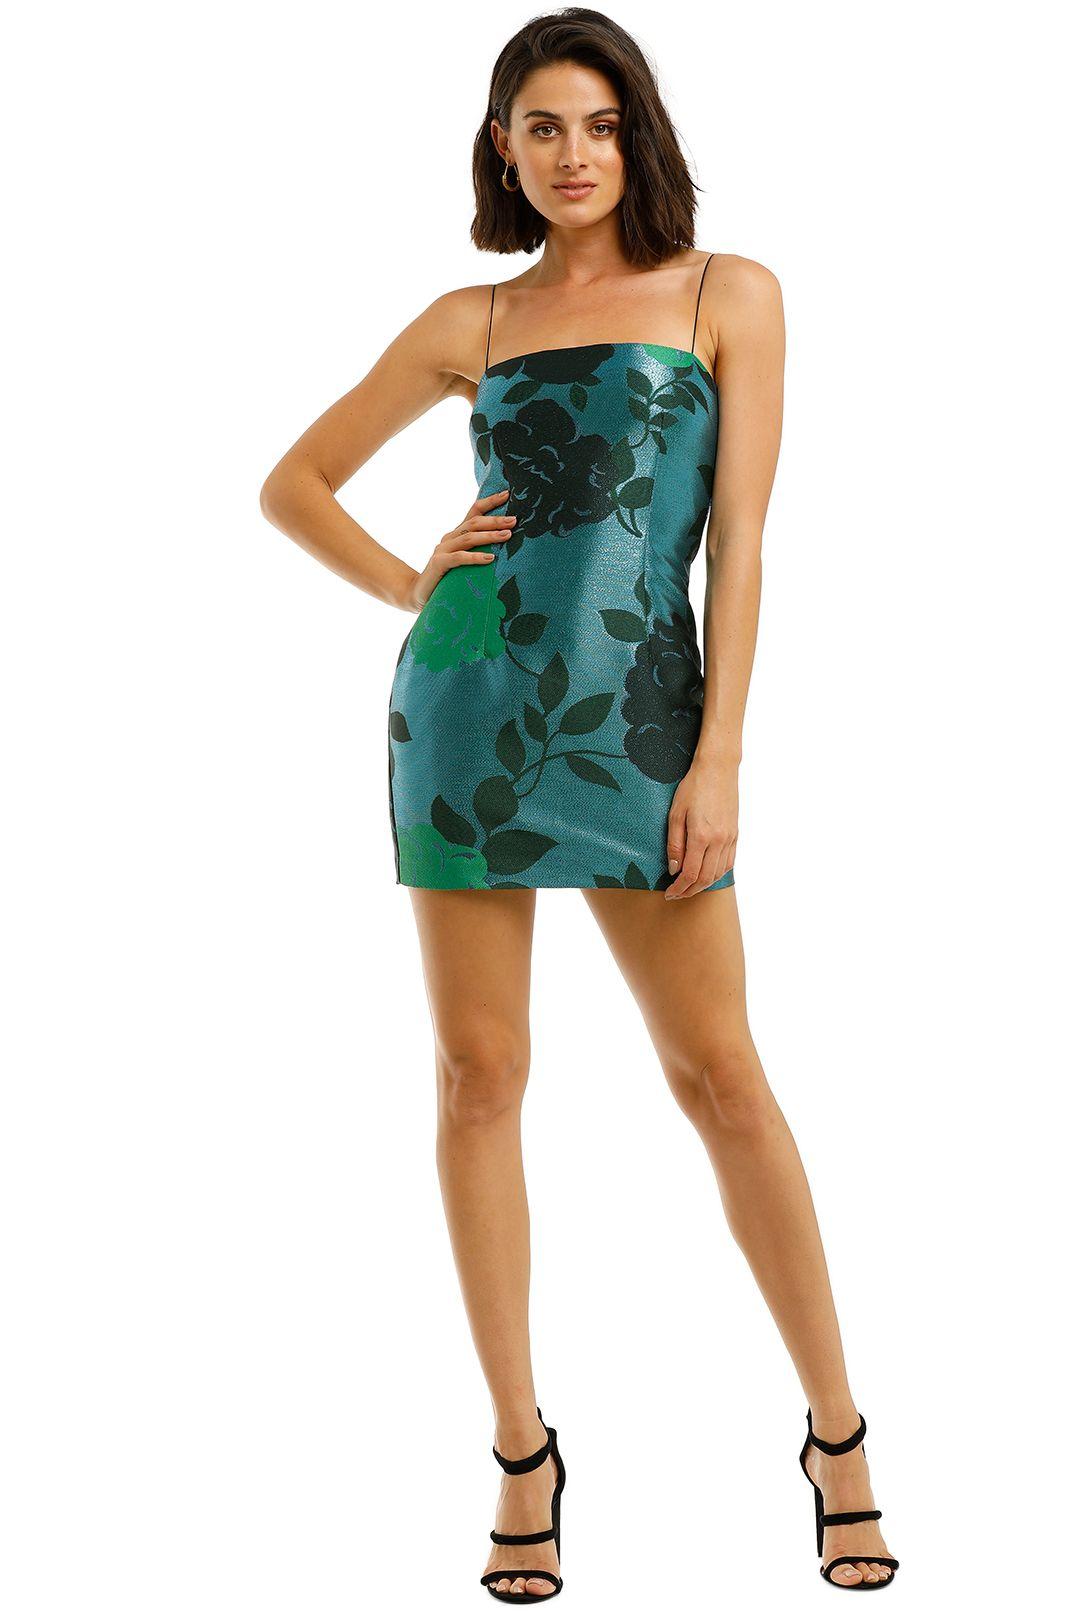 Bec-and-Bridge-Sparkle-Soiree-Mini-Dress-Lurex-Front